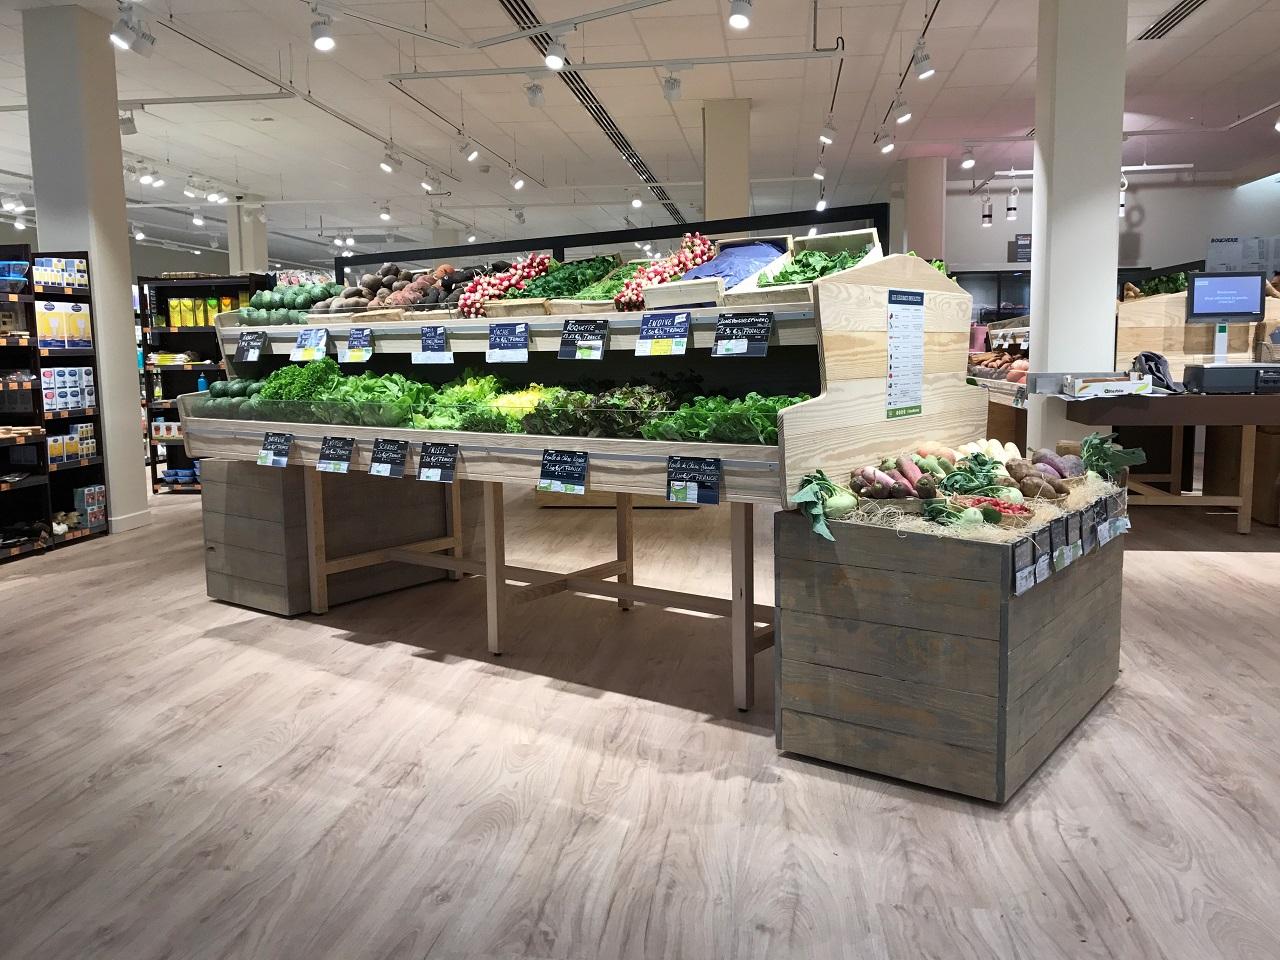 fenouil biocoop magasin bio le mans fruits legumes